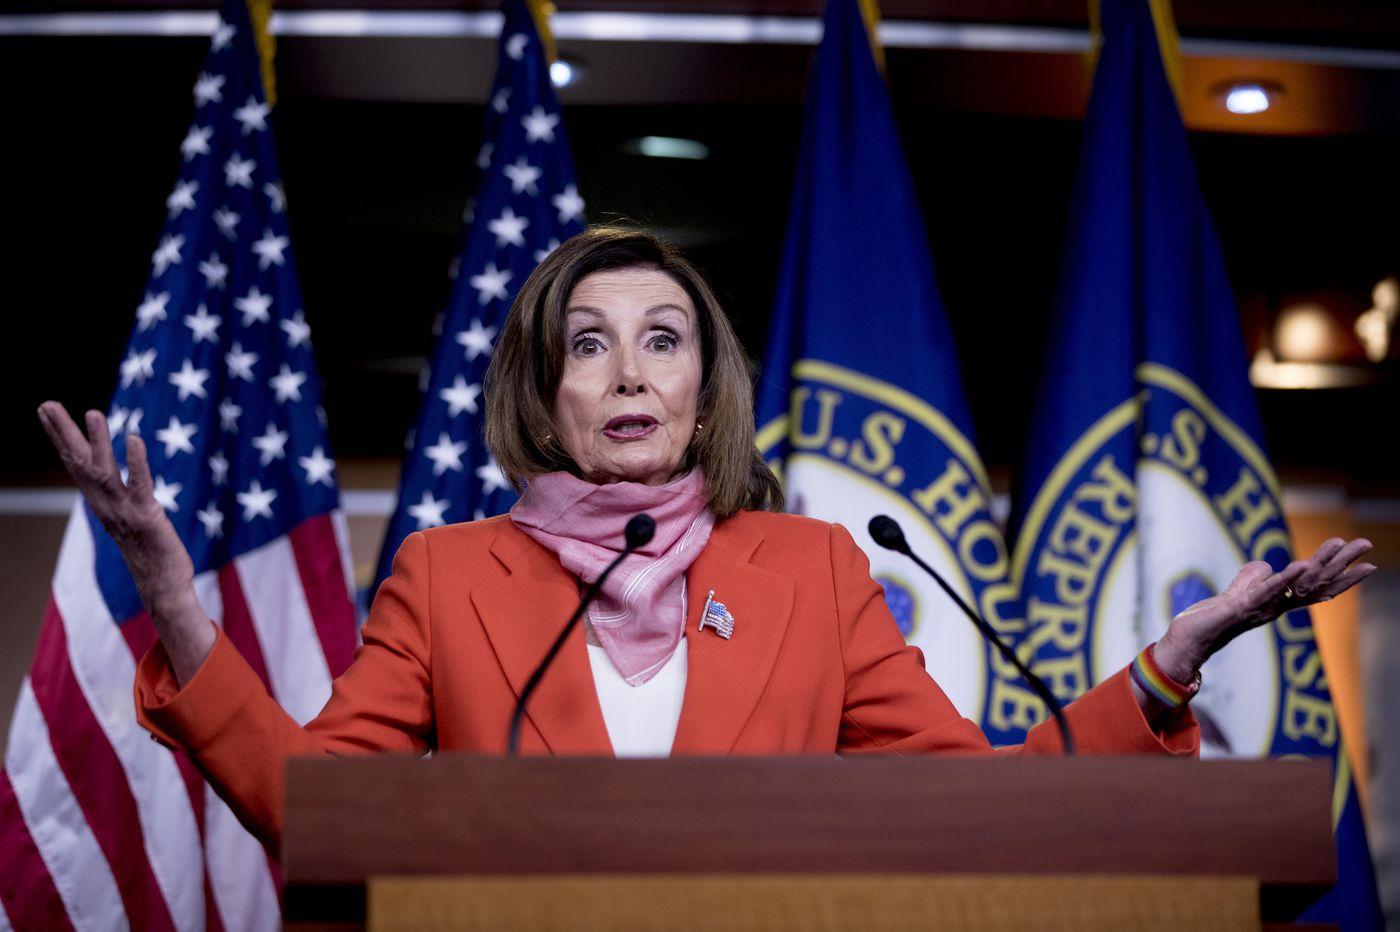 2020 election: Nancy Pelosi endorses Joe Biden's presidential bid